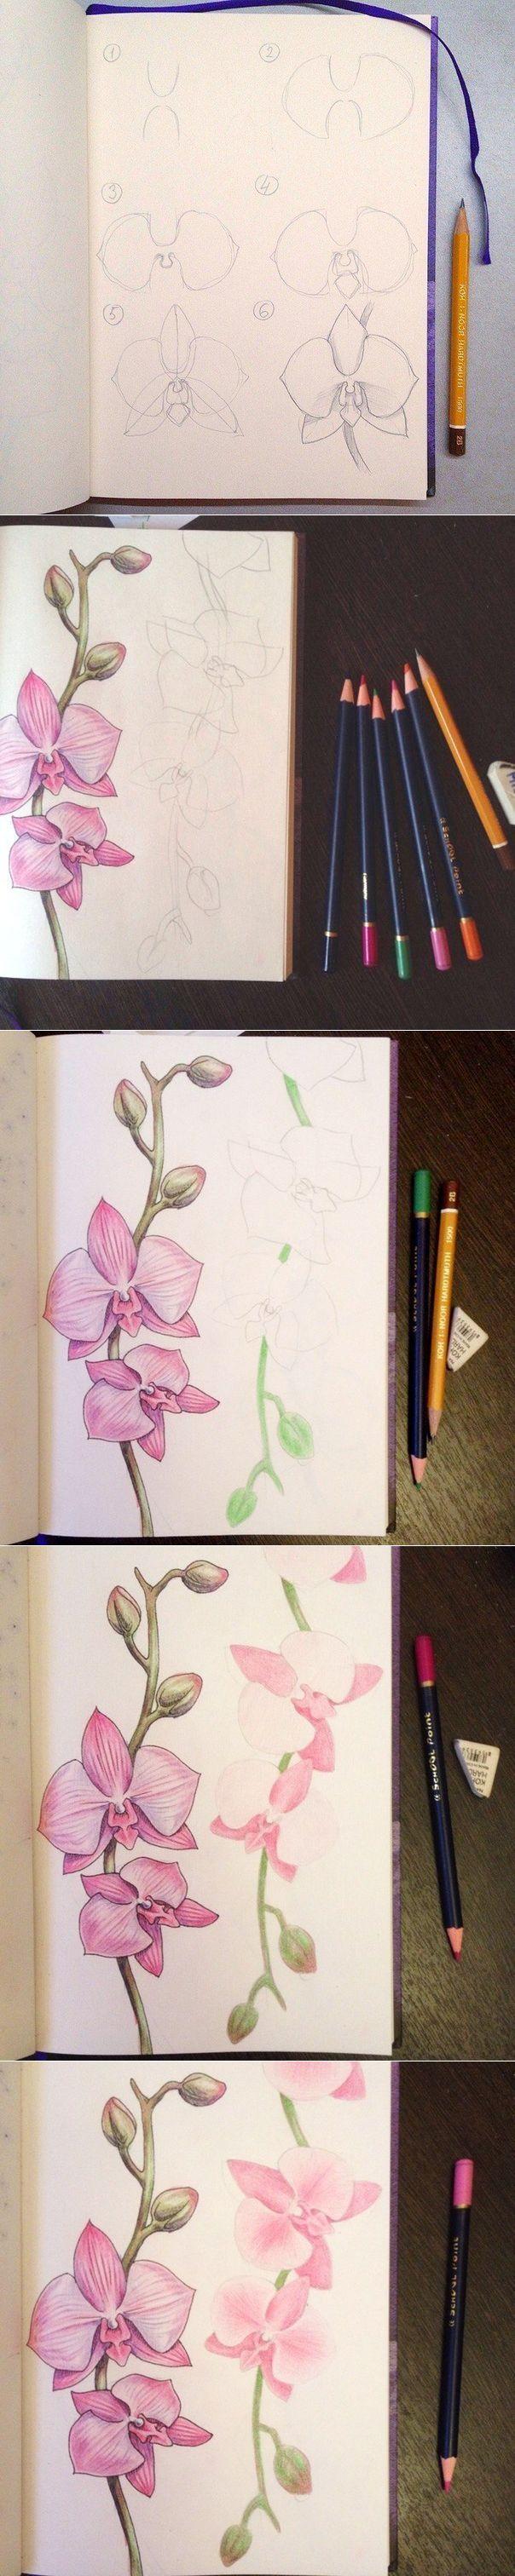 УЧИМСЯ РИСОВАТЬ orchid create and drawings